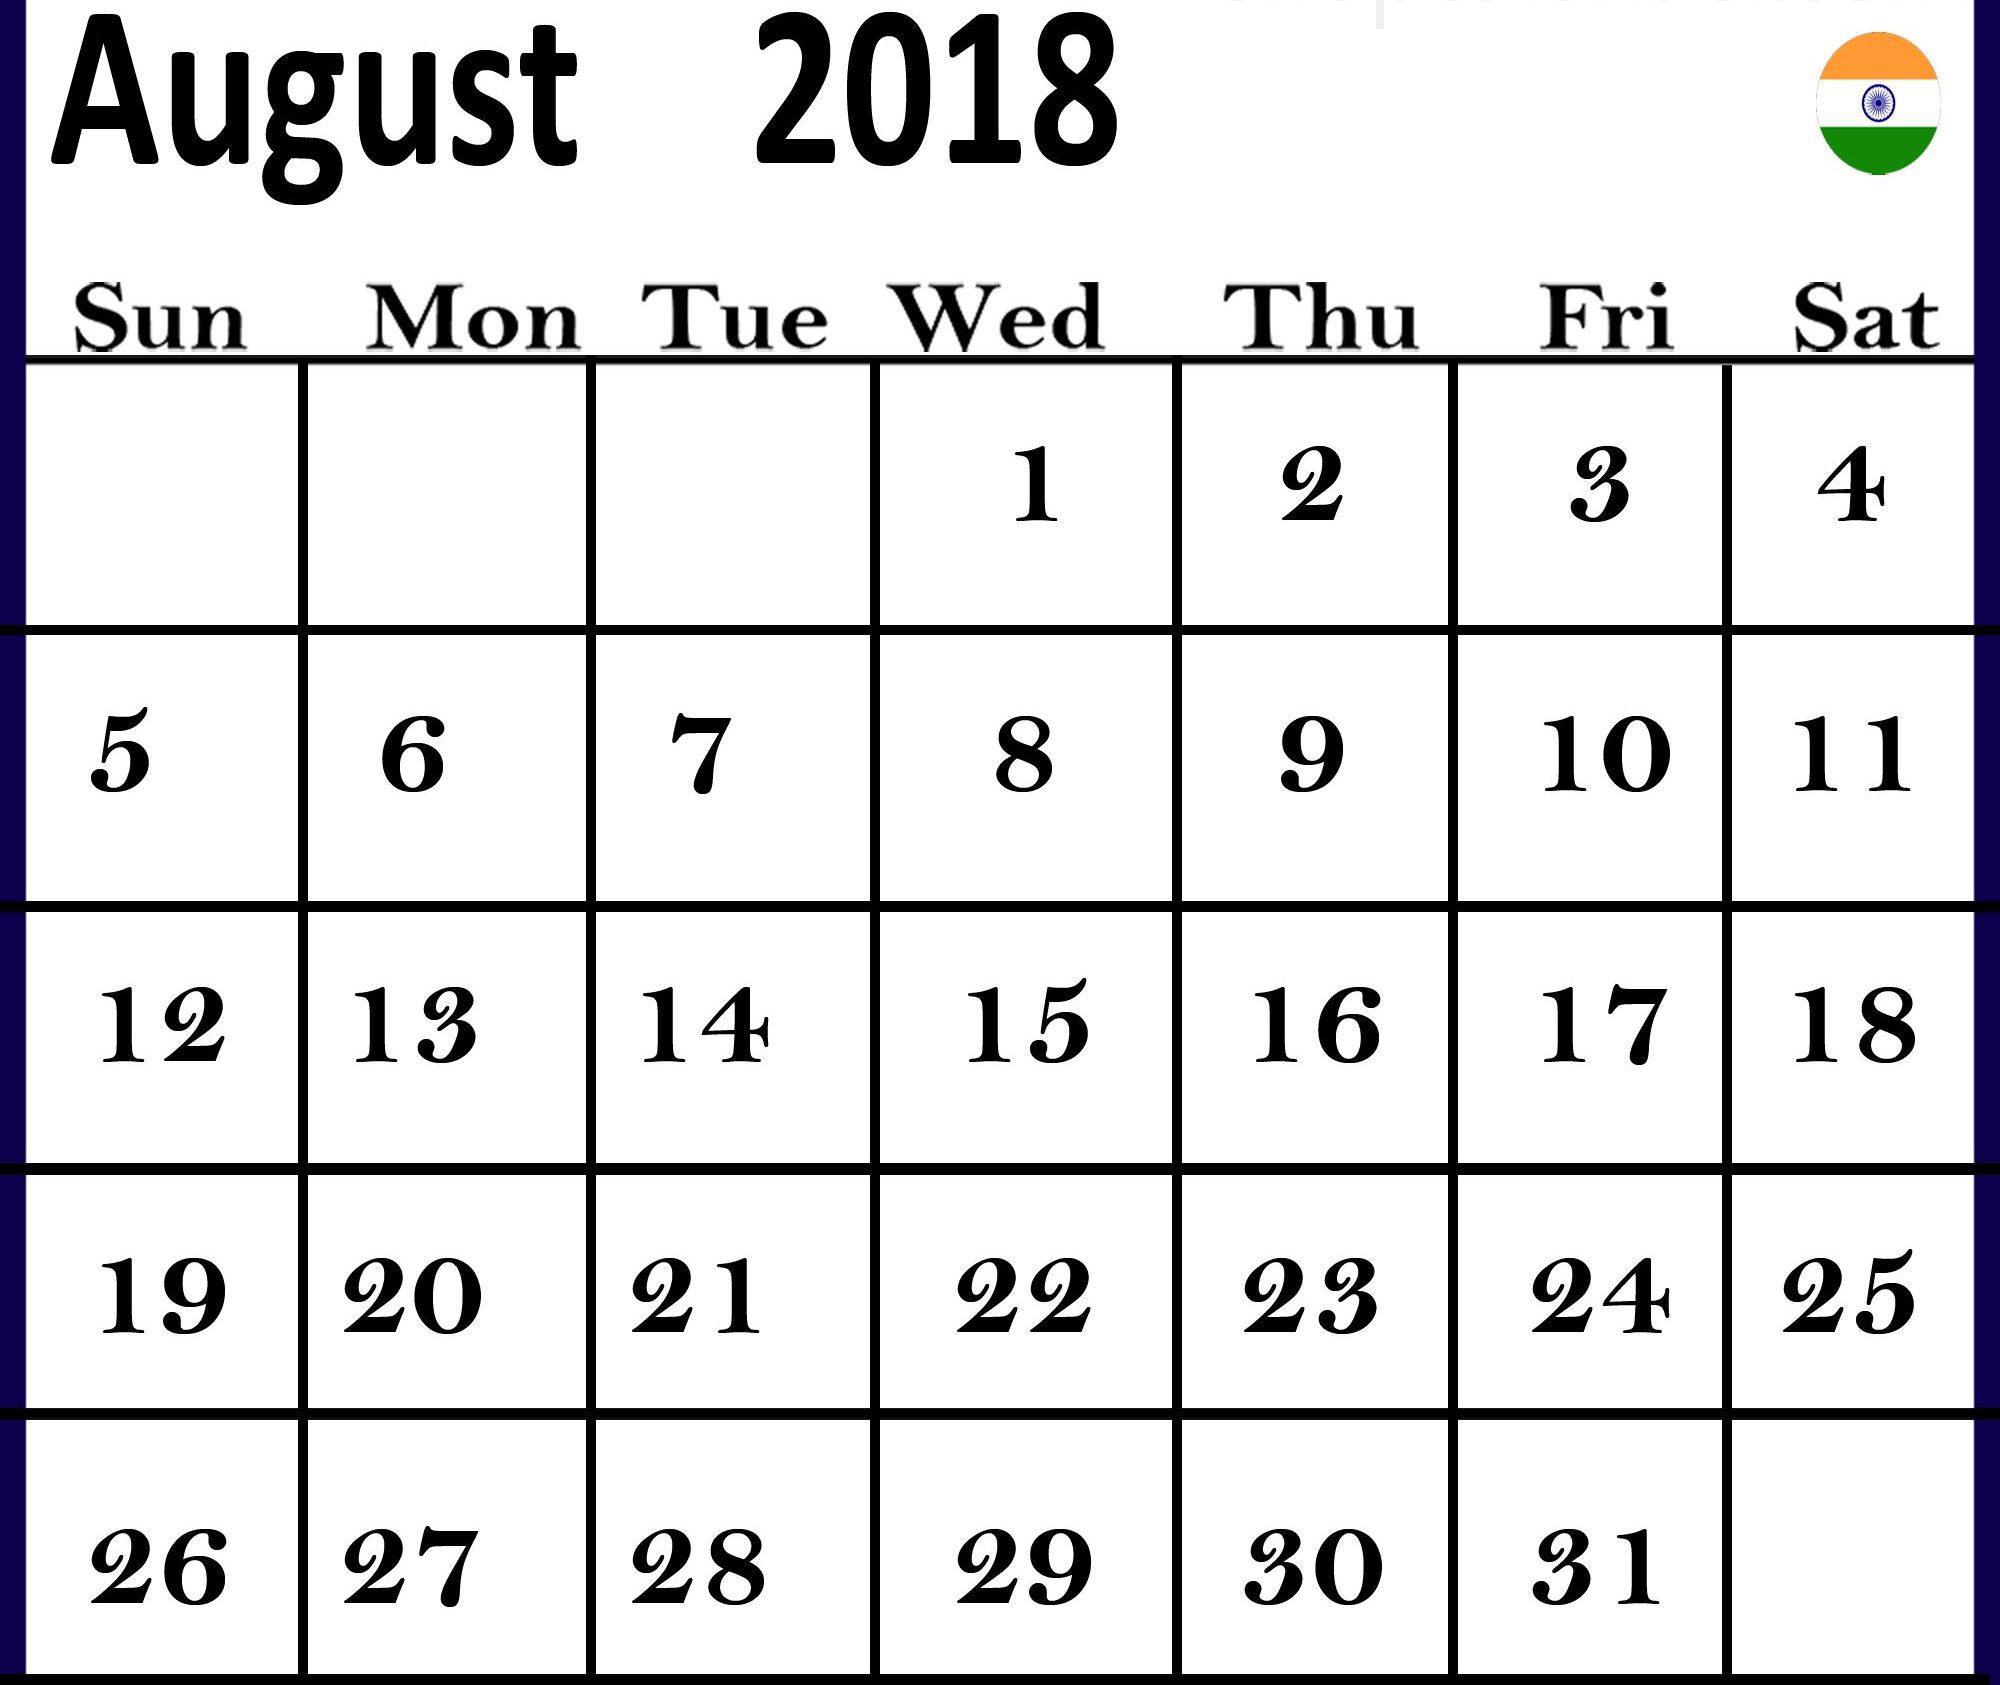 August 2018 Calendar India Holidays